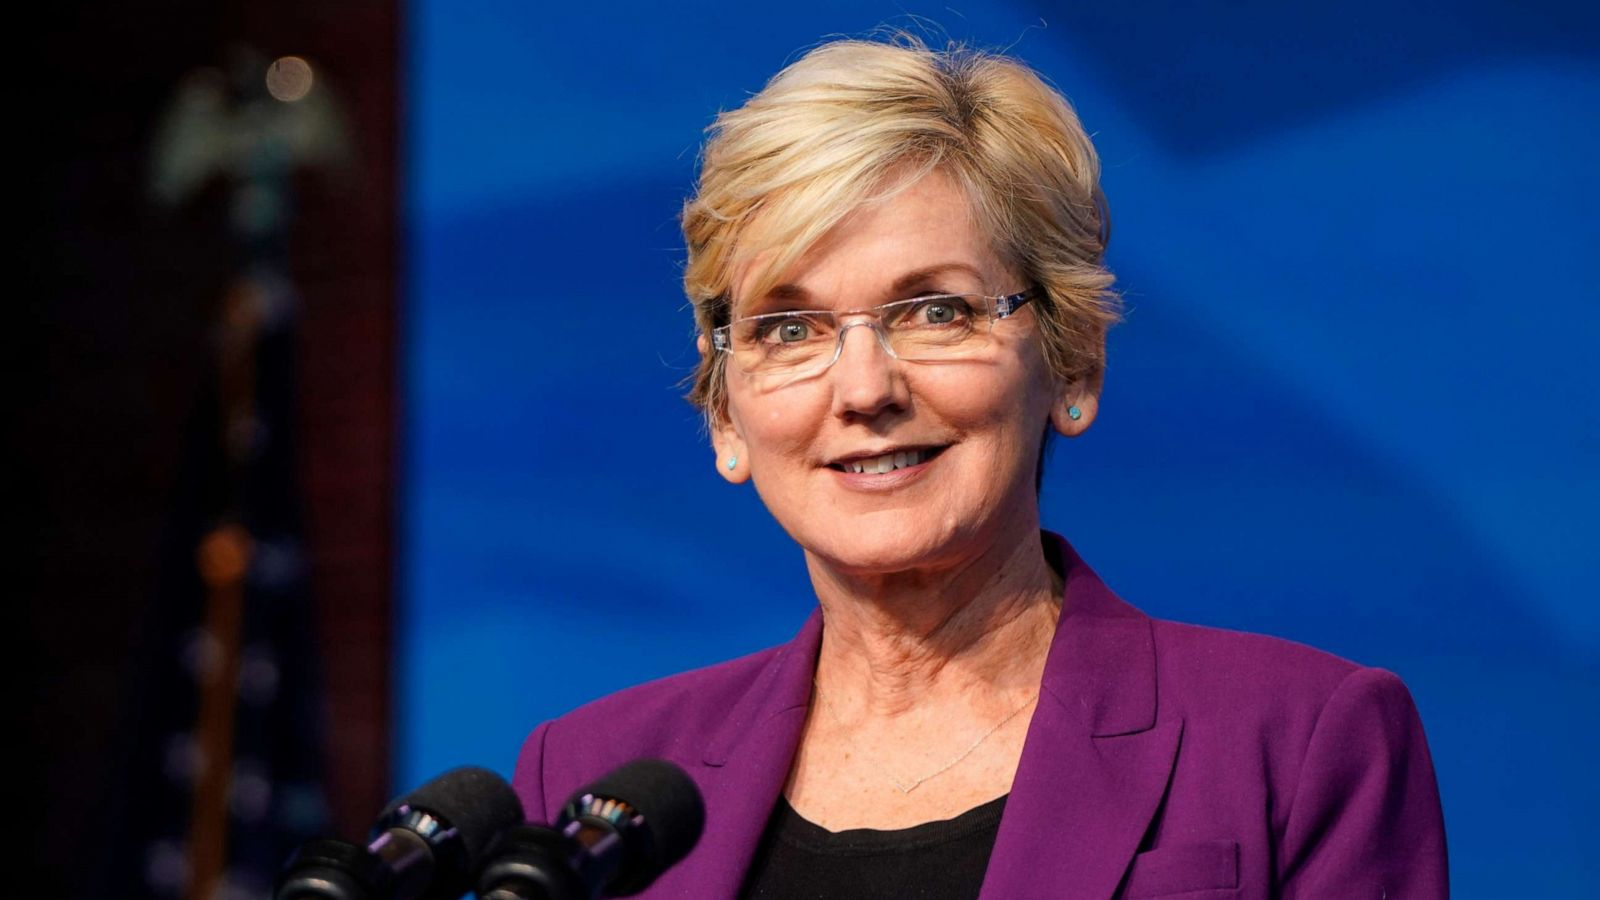 abcnews.go.com - Soo Rin Kim - Biden energy secretary nominee Jennifer Granholm has millions in energy investments, per new filing